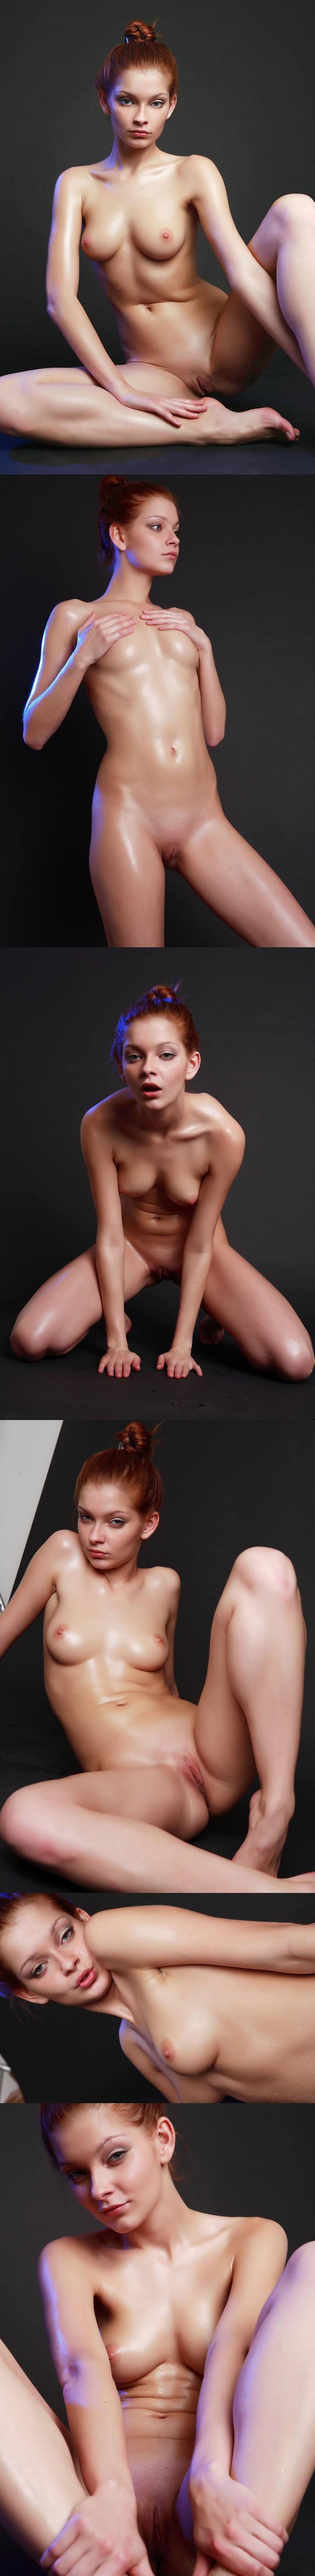 MA_20081130_-_Lidiya_A__Miranda_A_-_Bond_-_by_Sergey_Goncharov.zip-jk- Met-Art MA 20081201 - Indiana A - Complete - by Luca Simoni